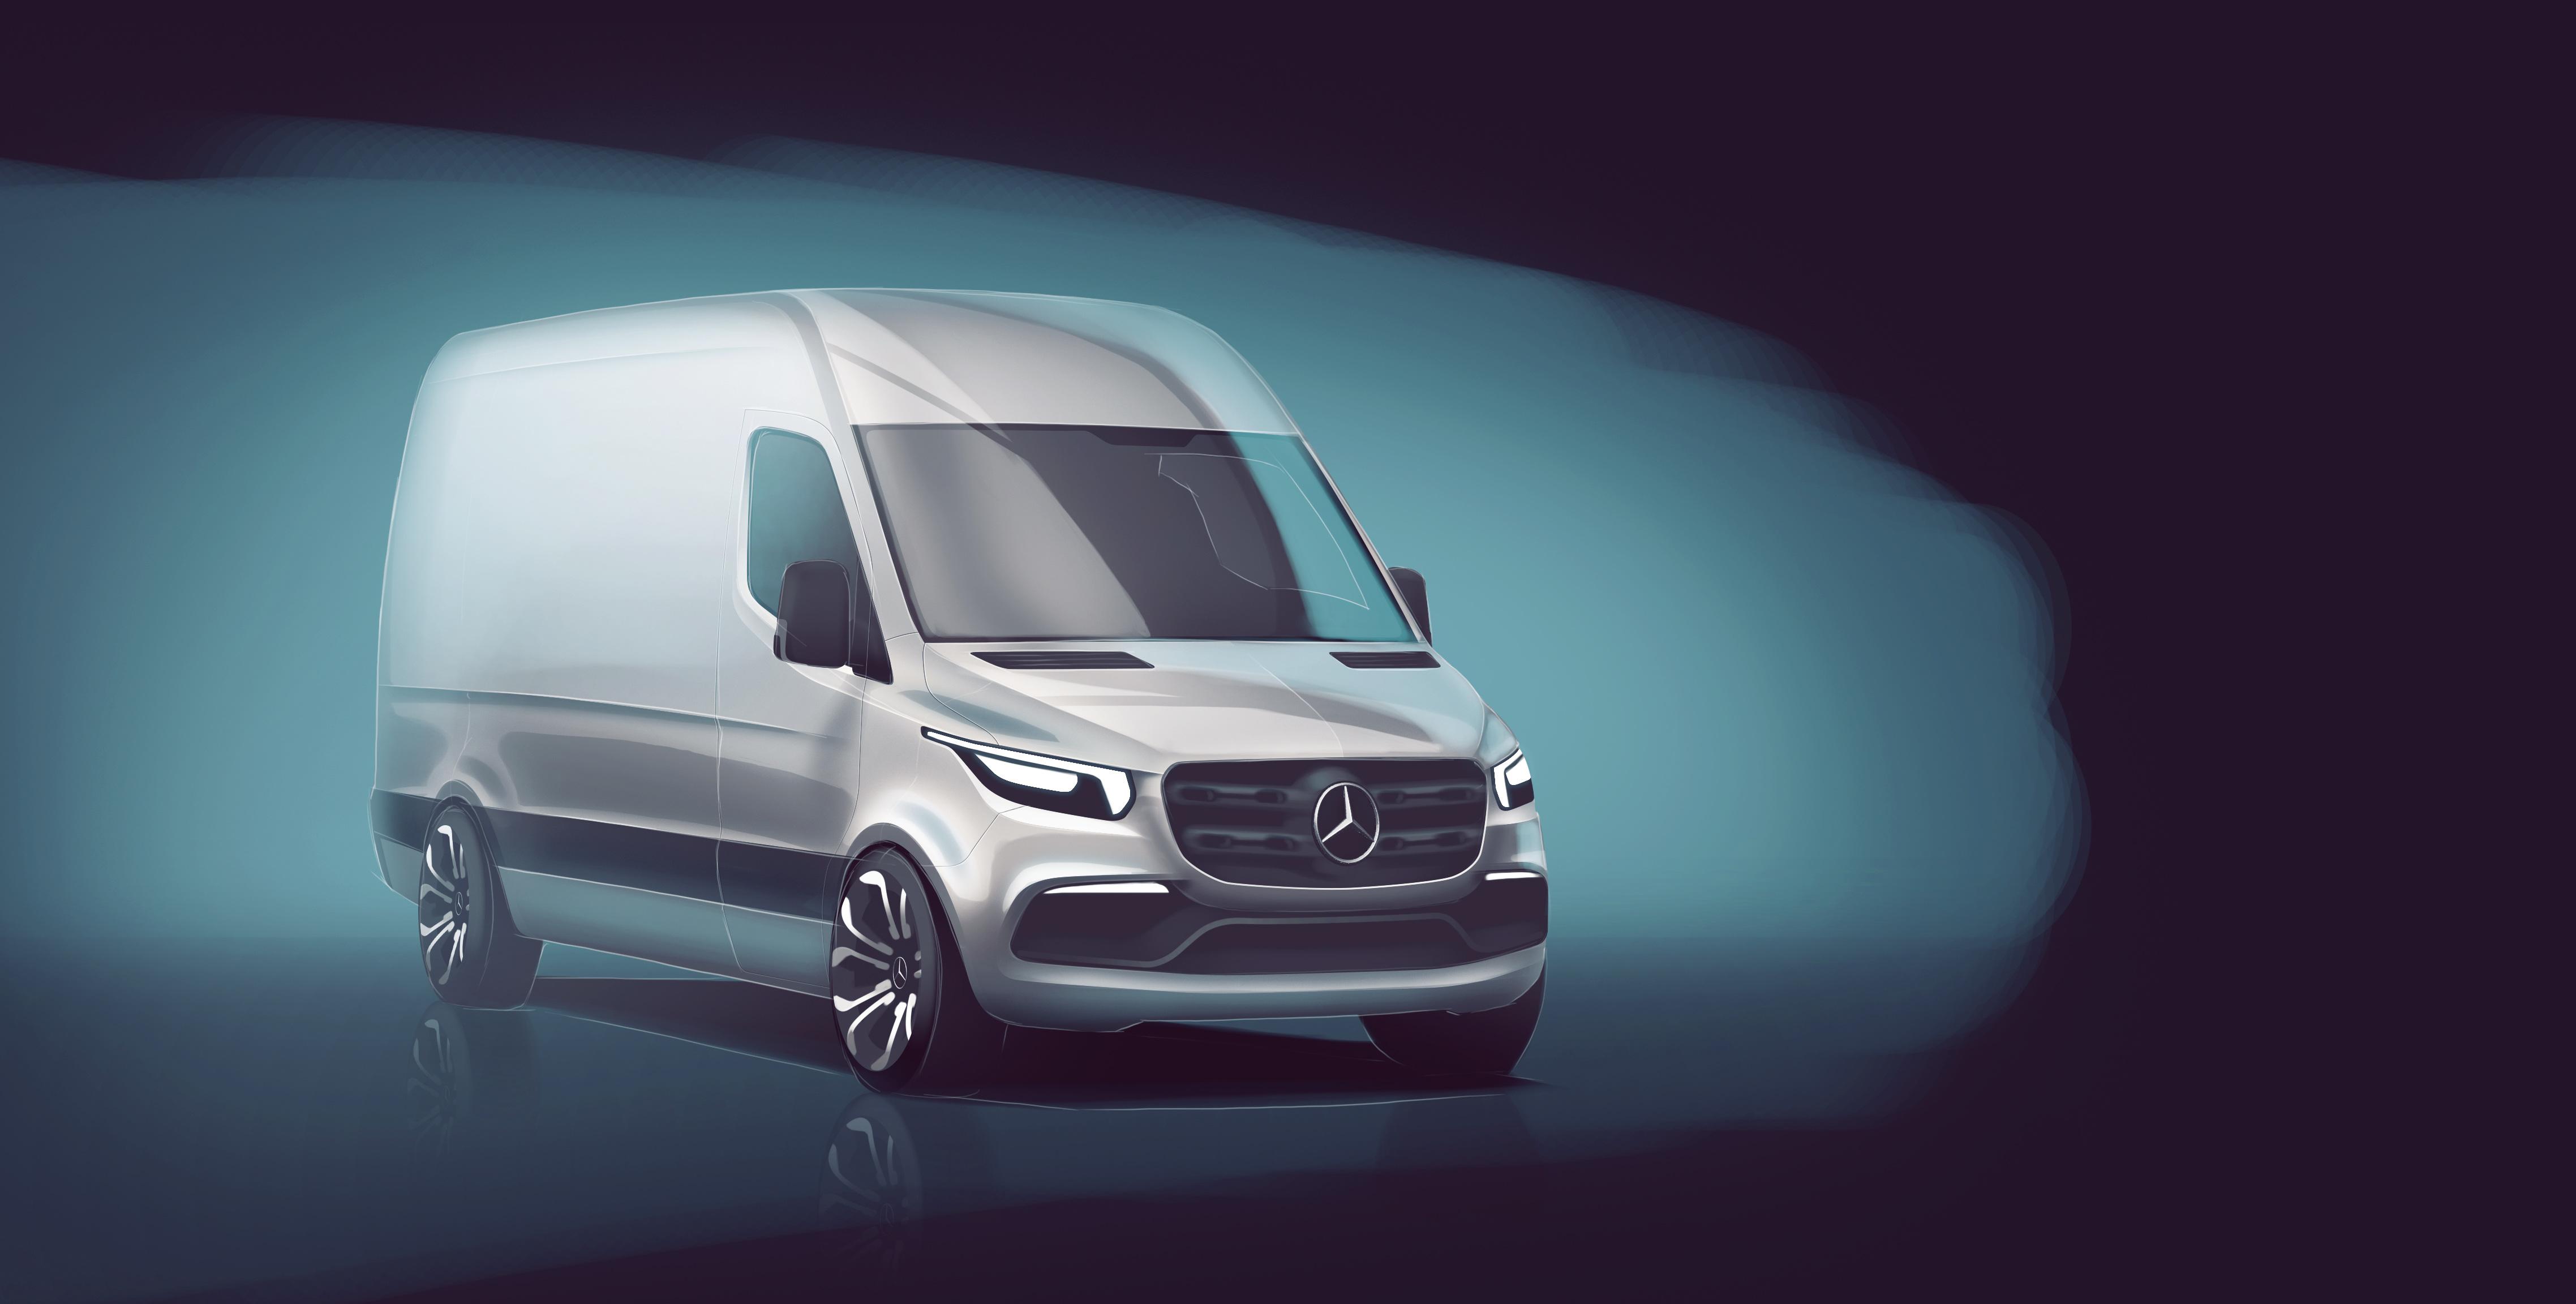 First look at Mercedes 2018 Sprinter Van